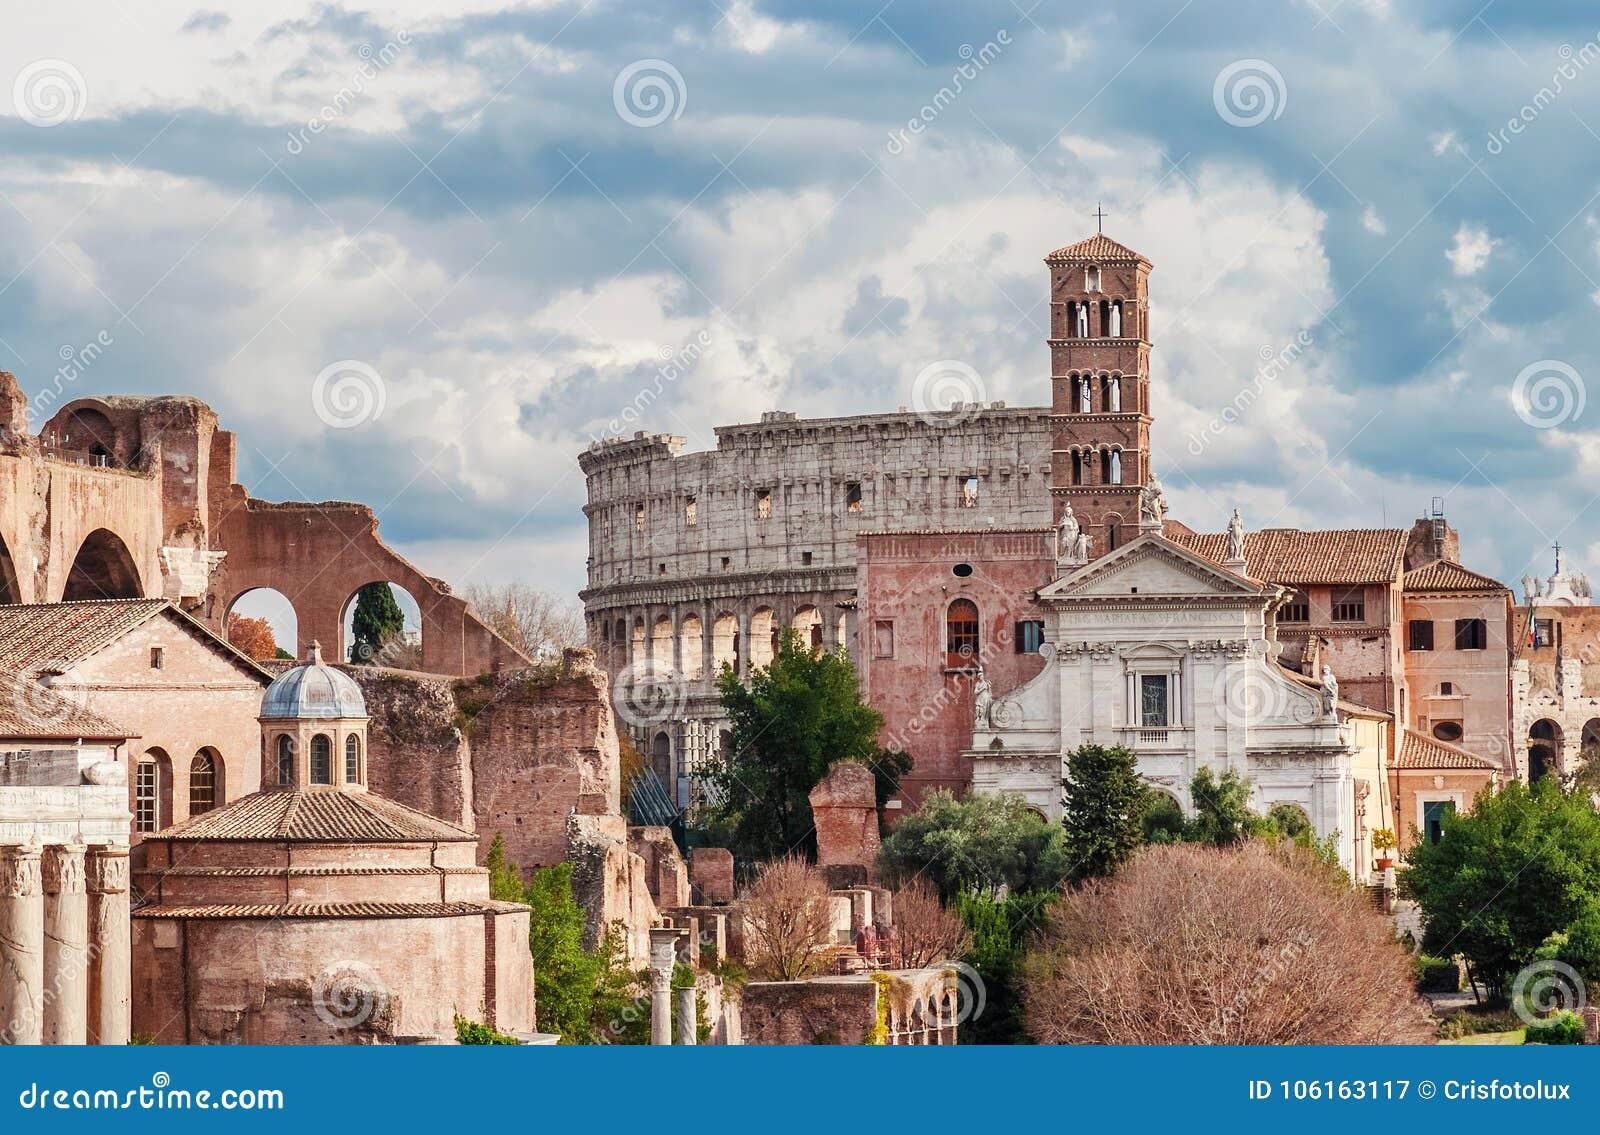 Heilige Frances van Rome met Coliseum